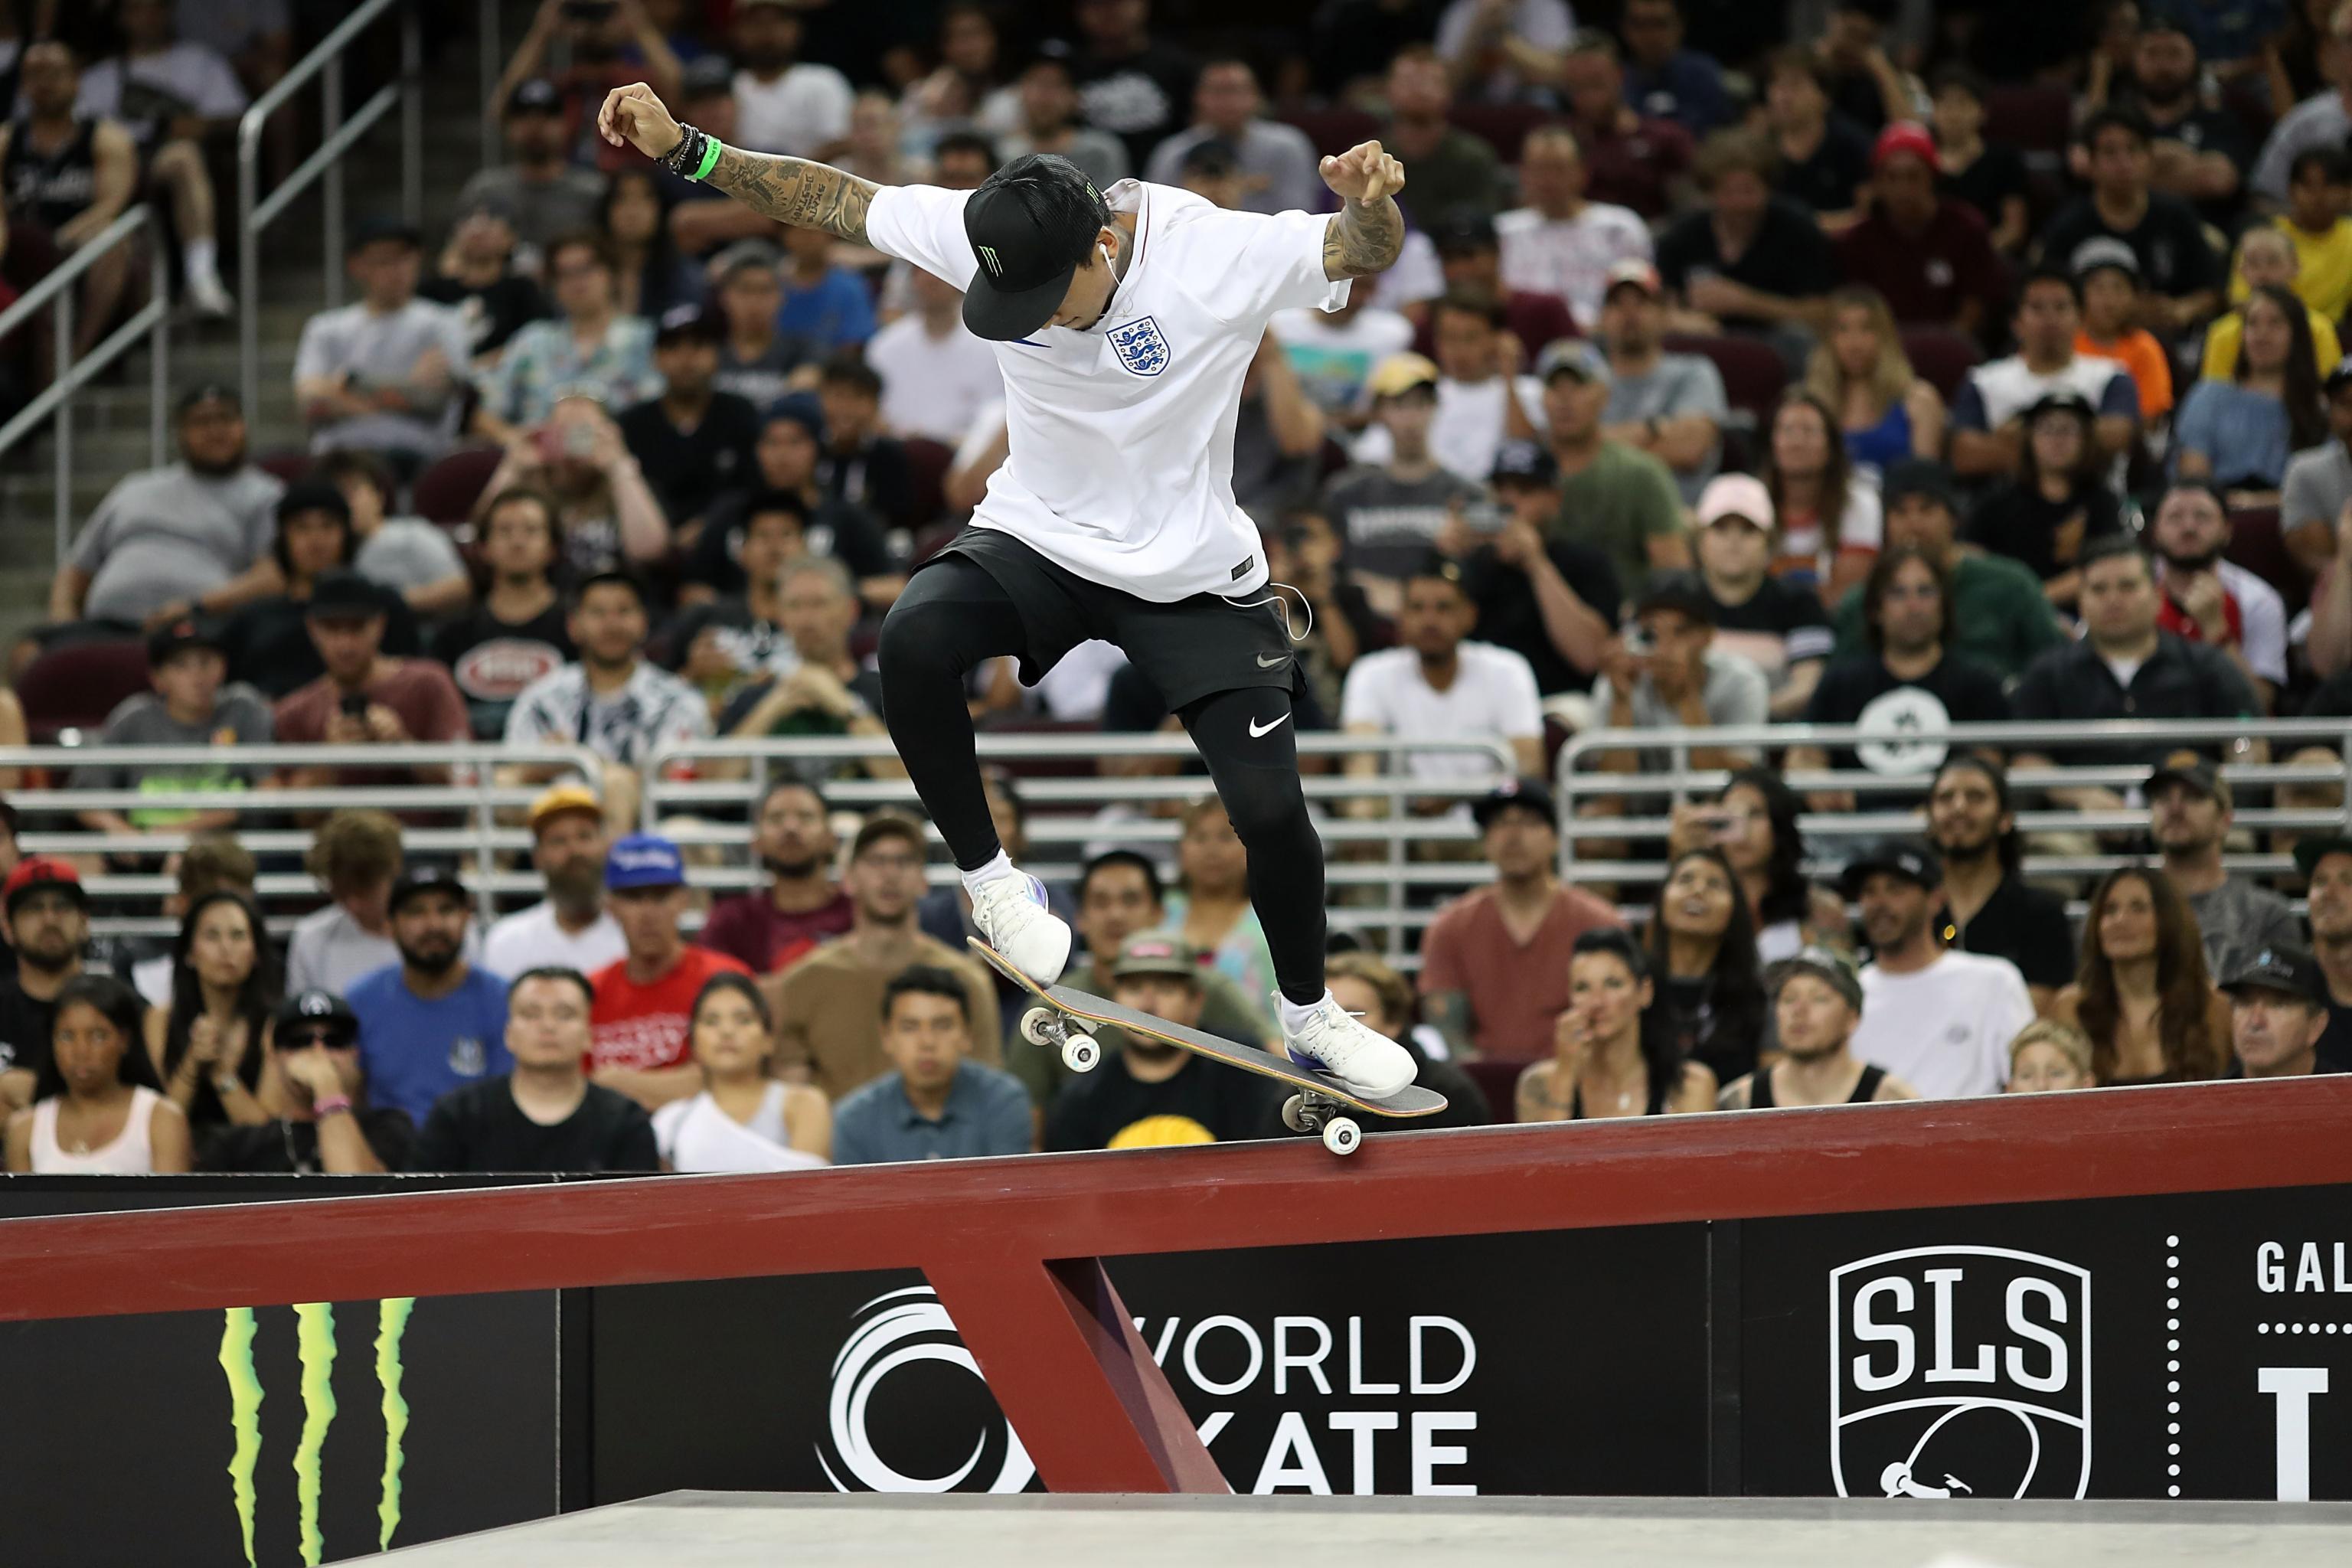 TMZ: Skateboarder Nyjah Huston Sued by Ryan Sheehy After